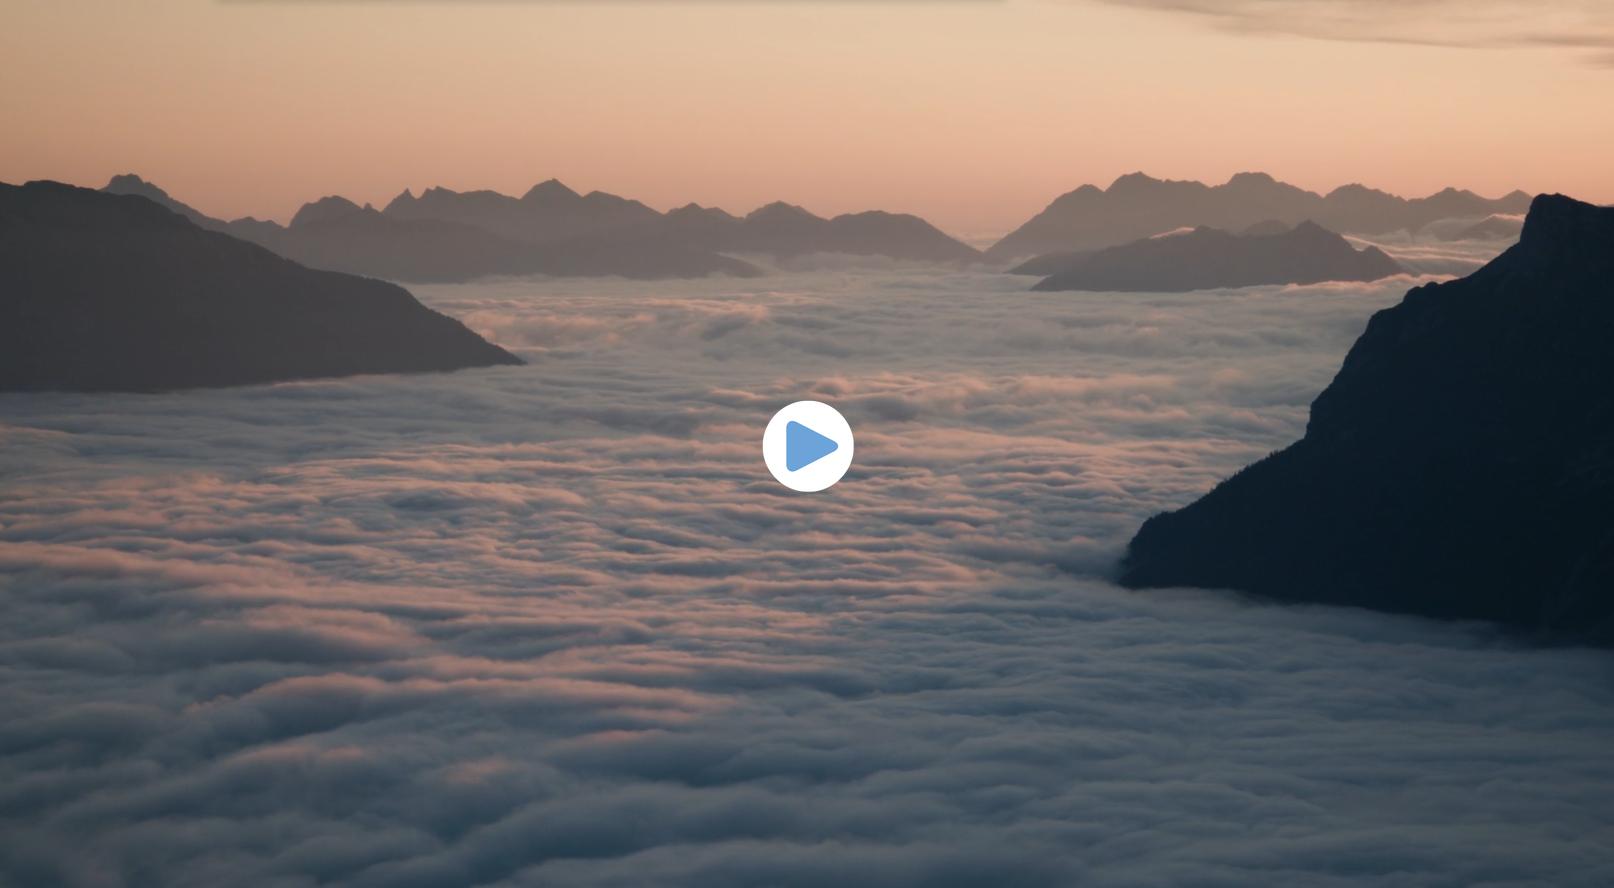 Tourismusfilm & Meditation | Lebensspur Lech